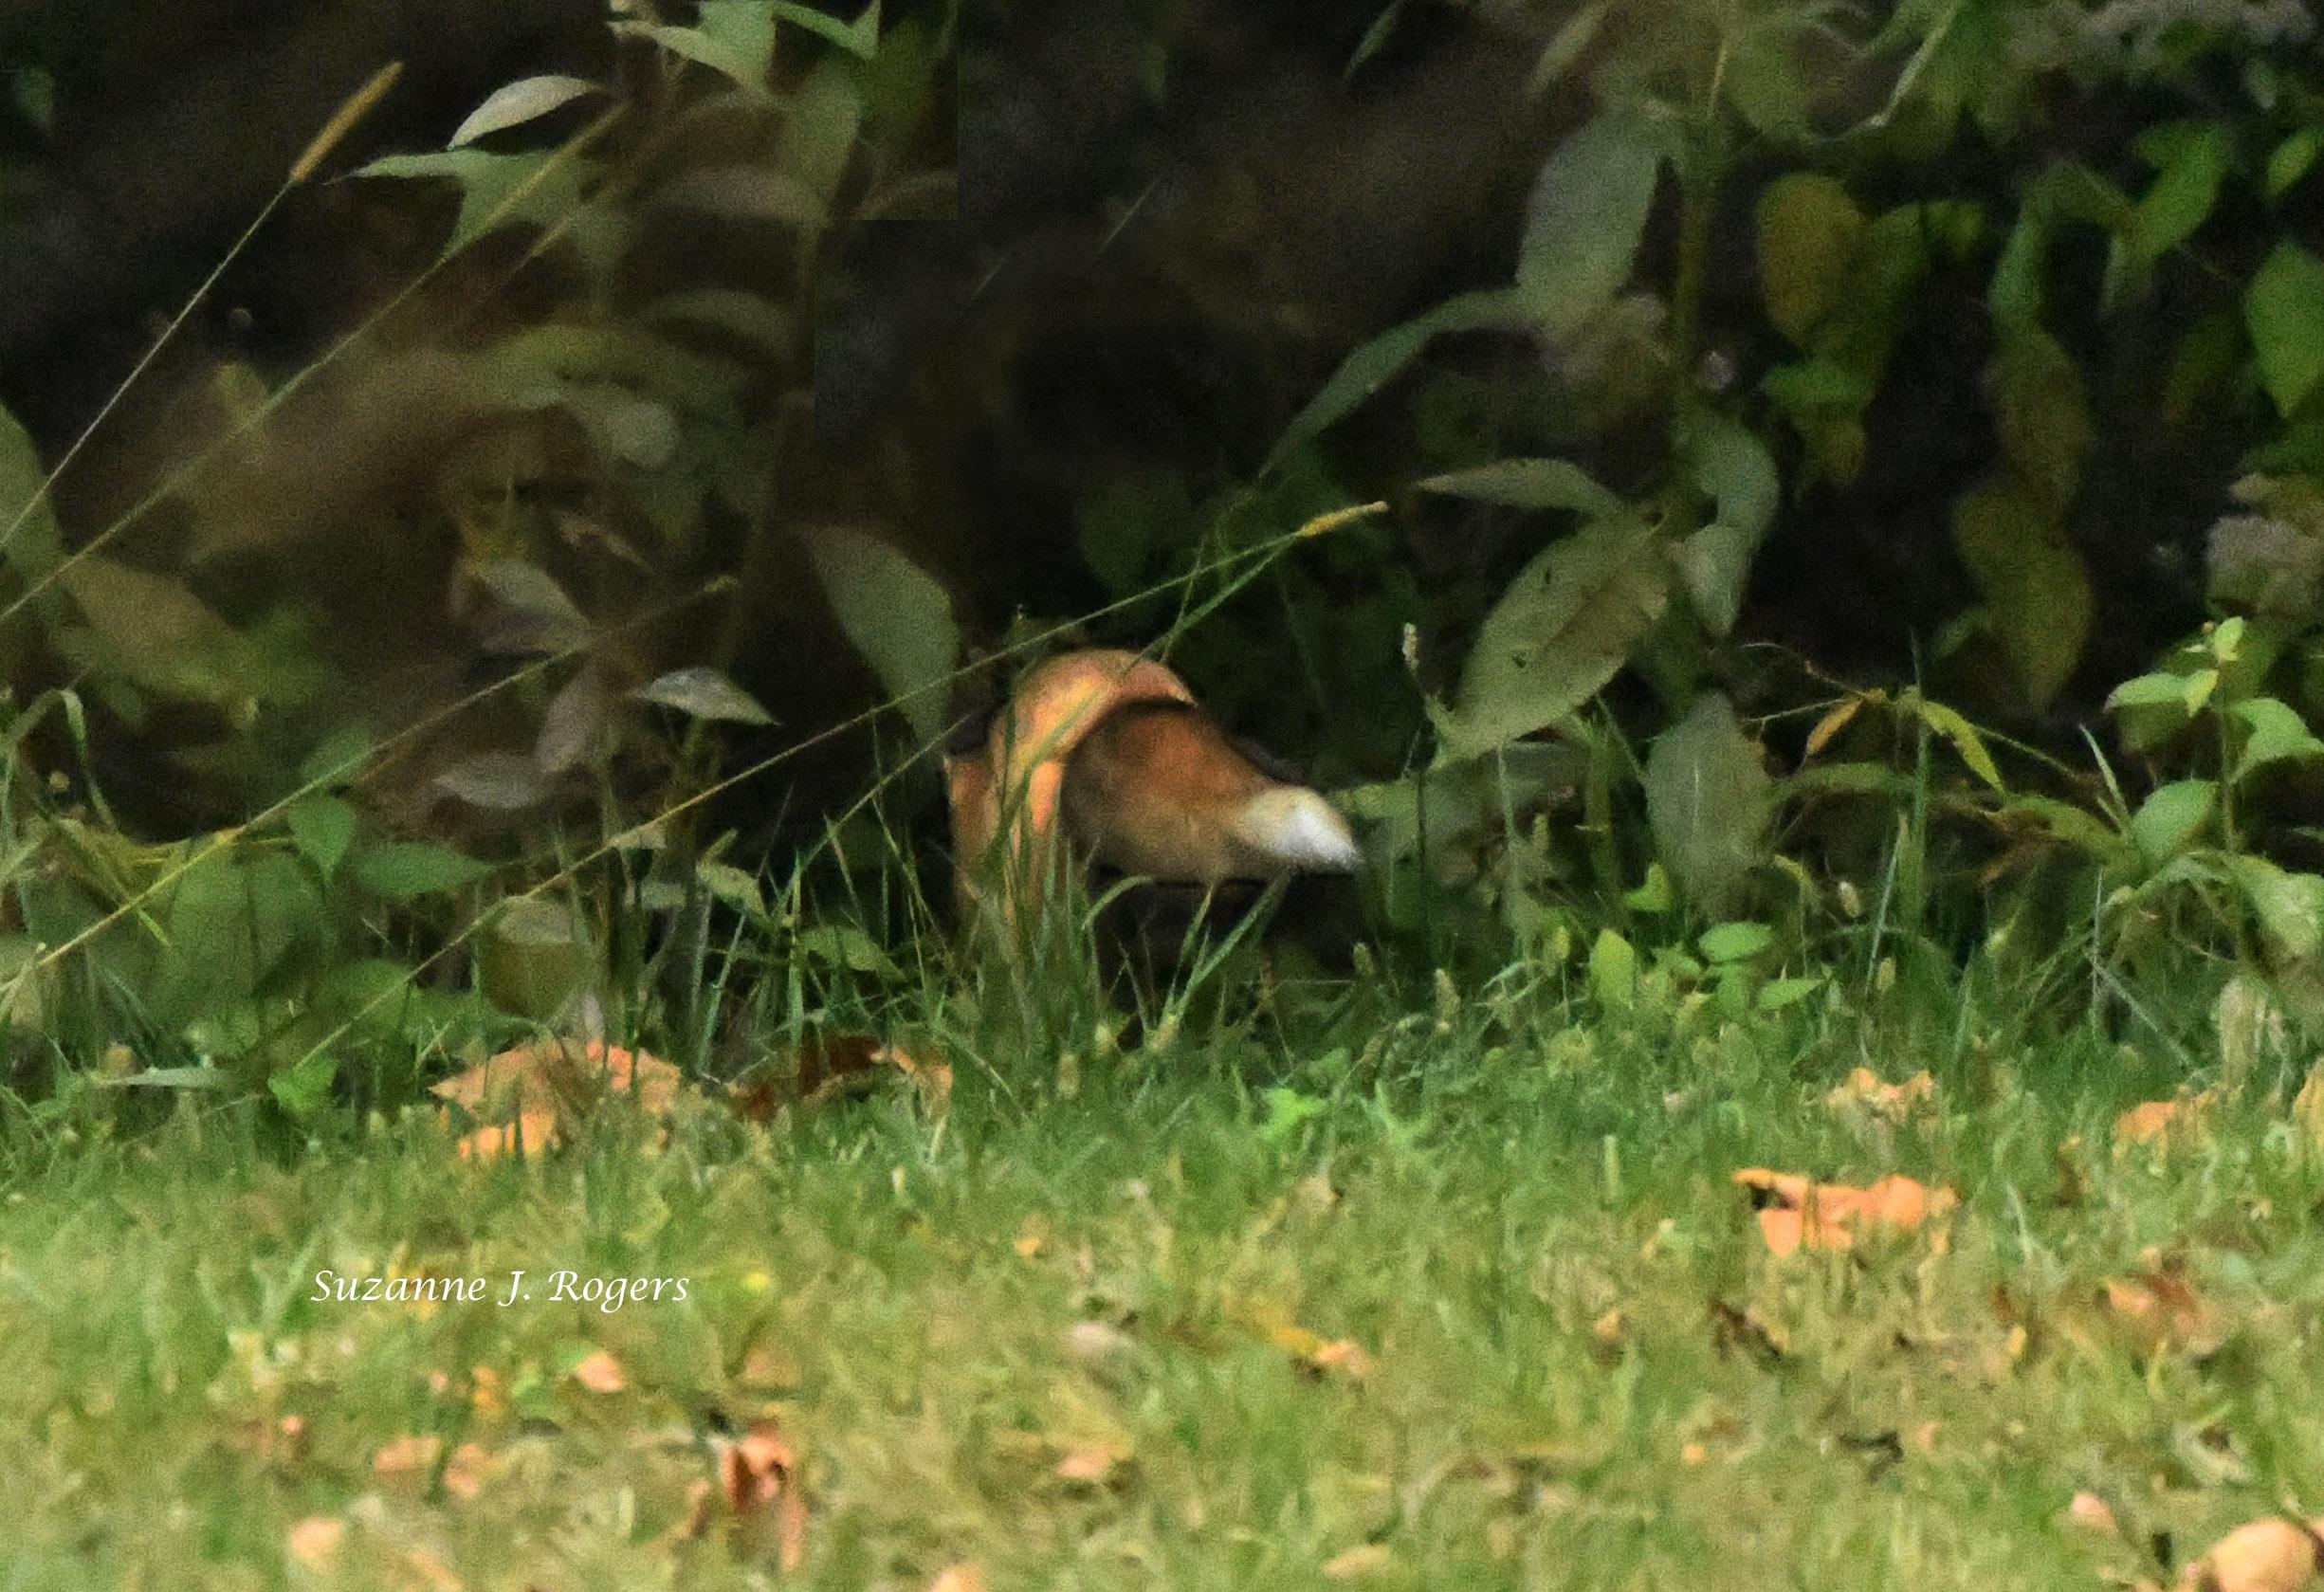 The Fox Tail wm